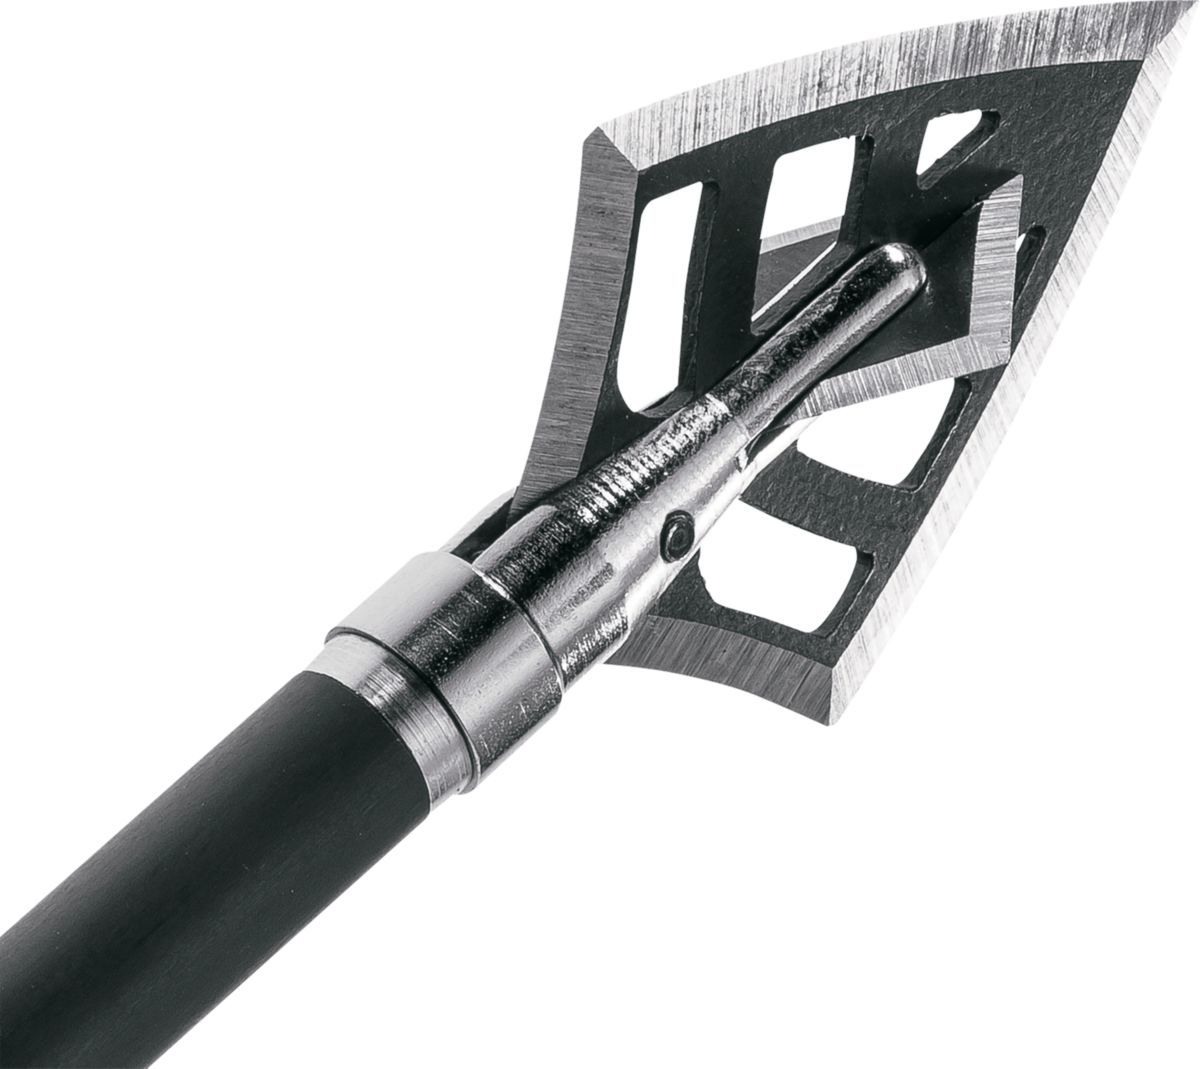 DirtNap Gear DRT Double-Bevel Broadheads